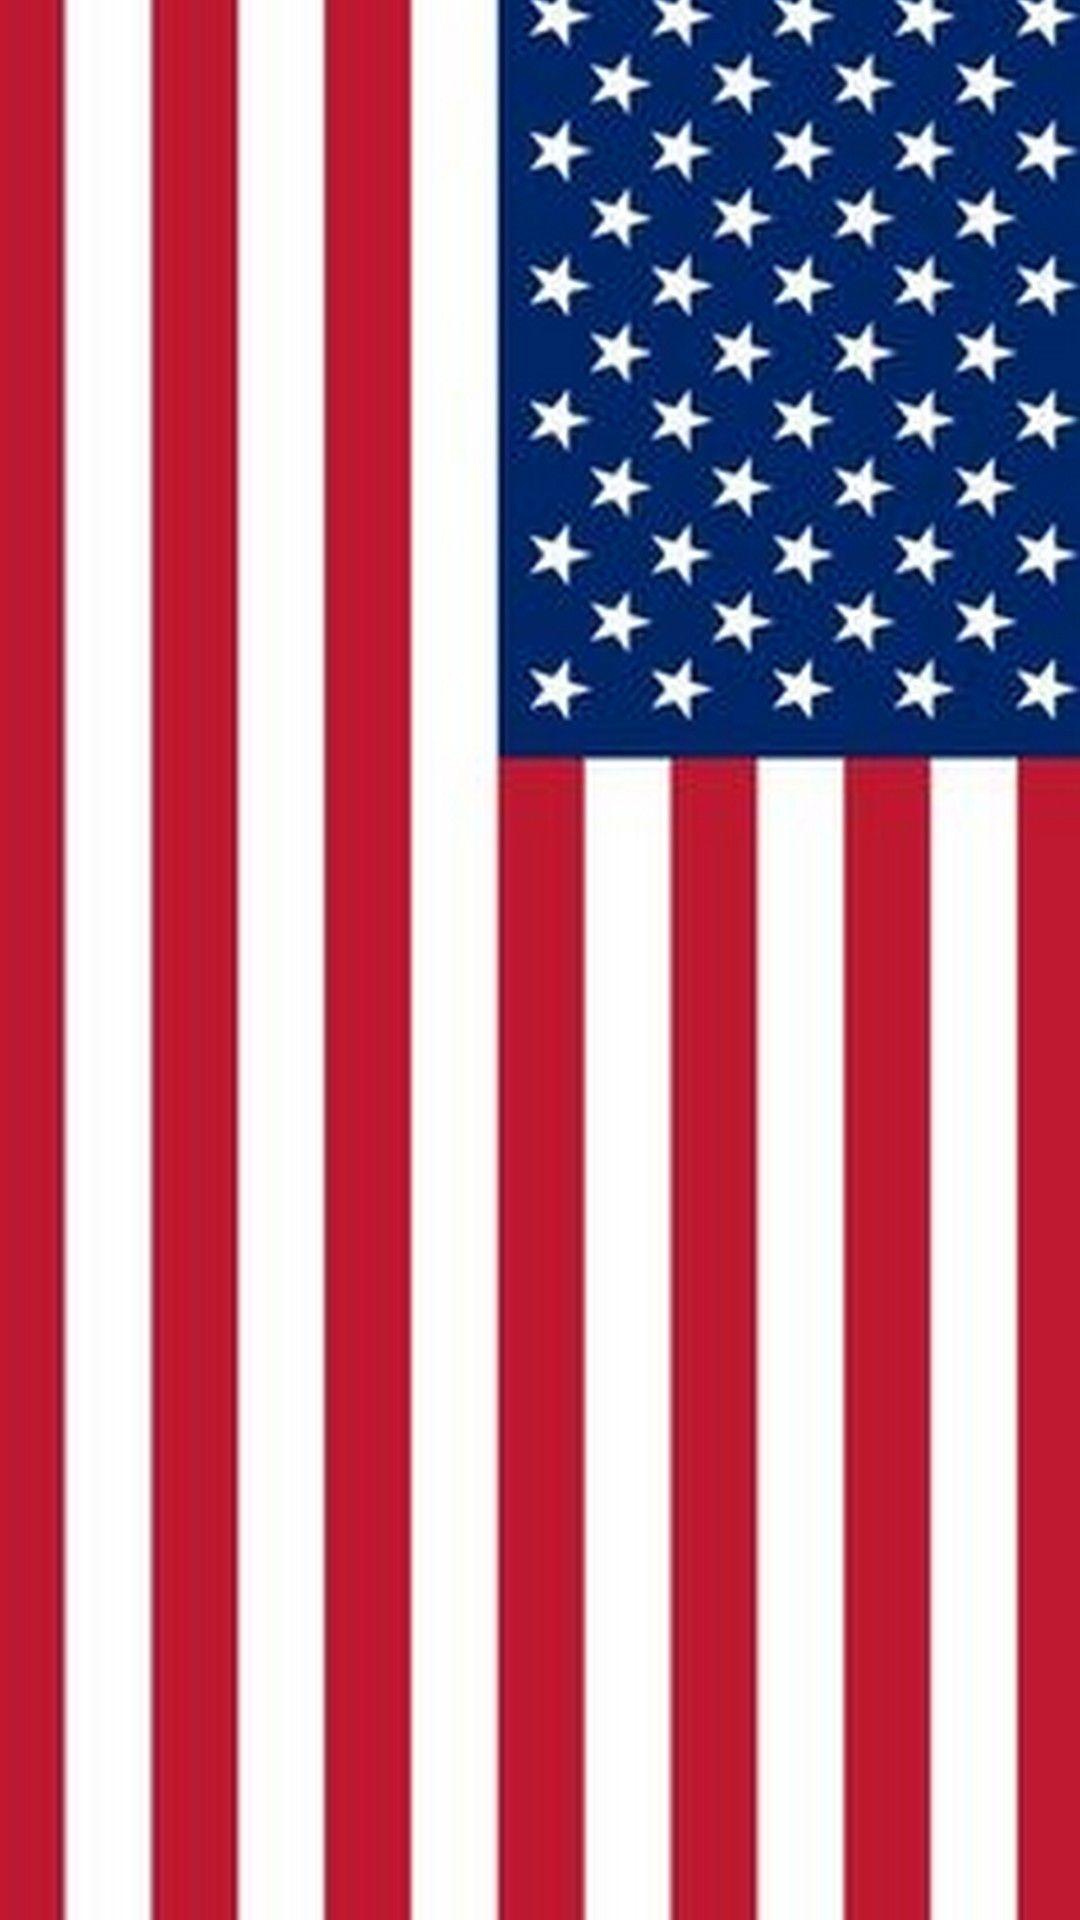 American Flag Cell Phones Wallpaper Best Phone Wallpaper Hd Patriotic Wallpaper American Flag Wallpaper Cellphone Wallpaper